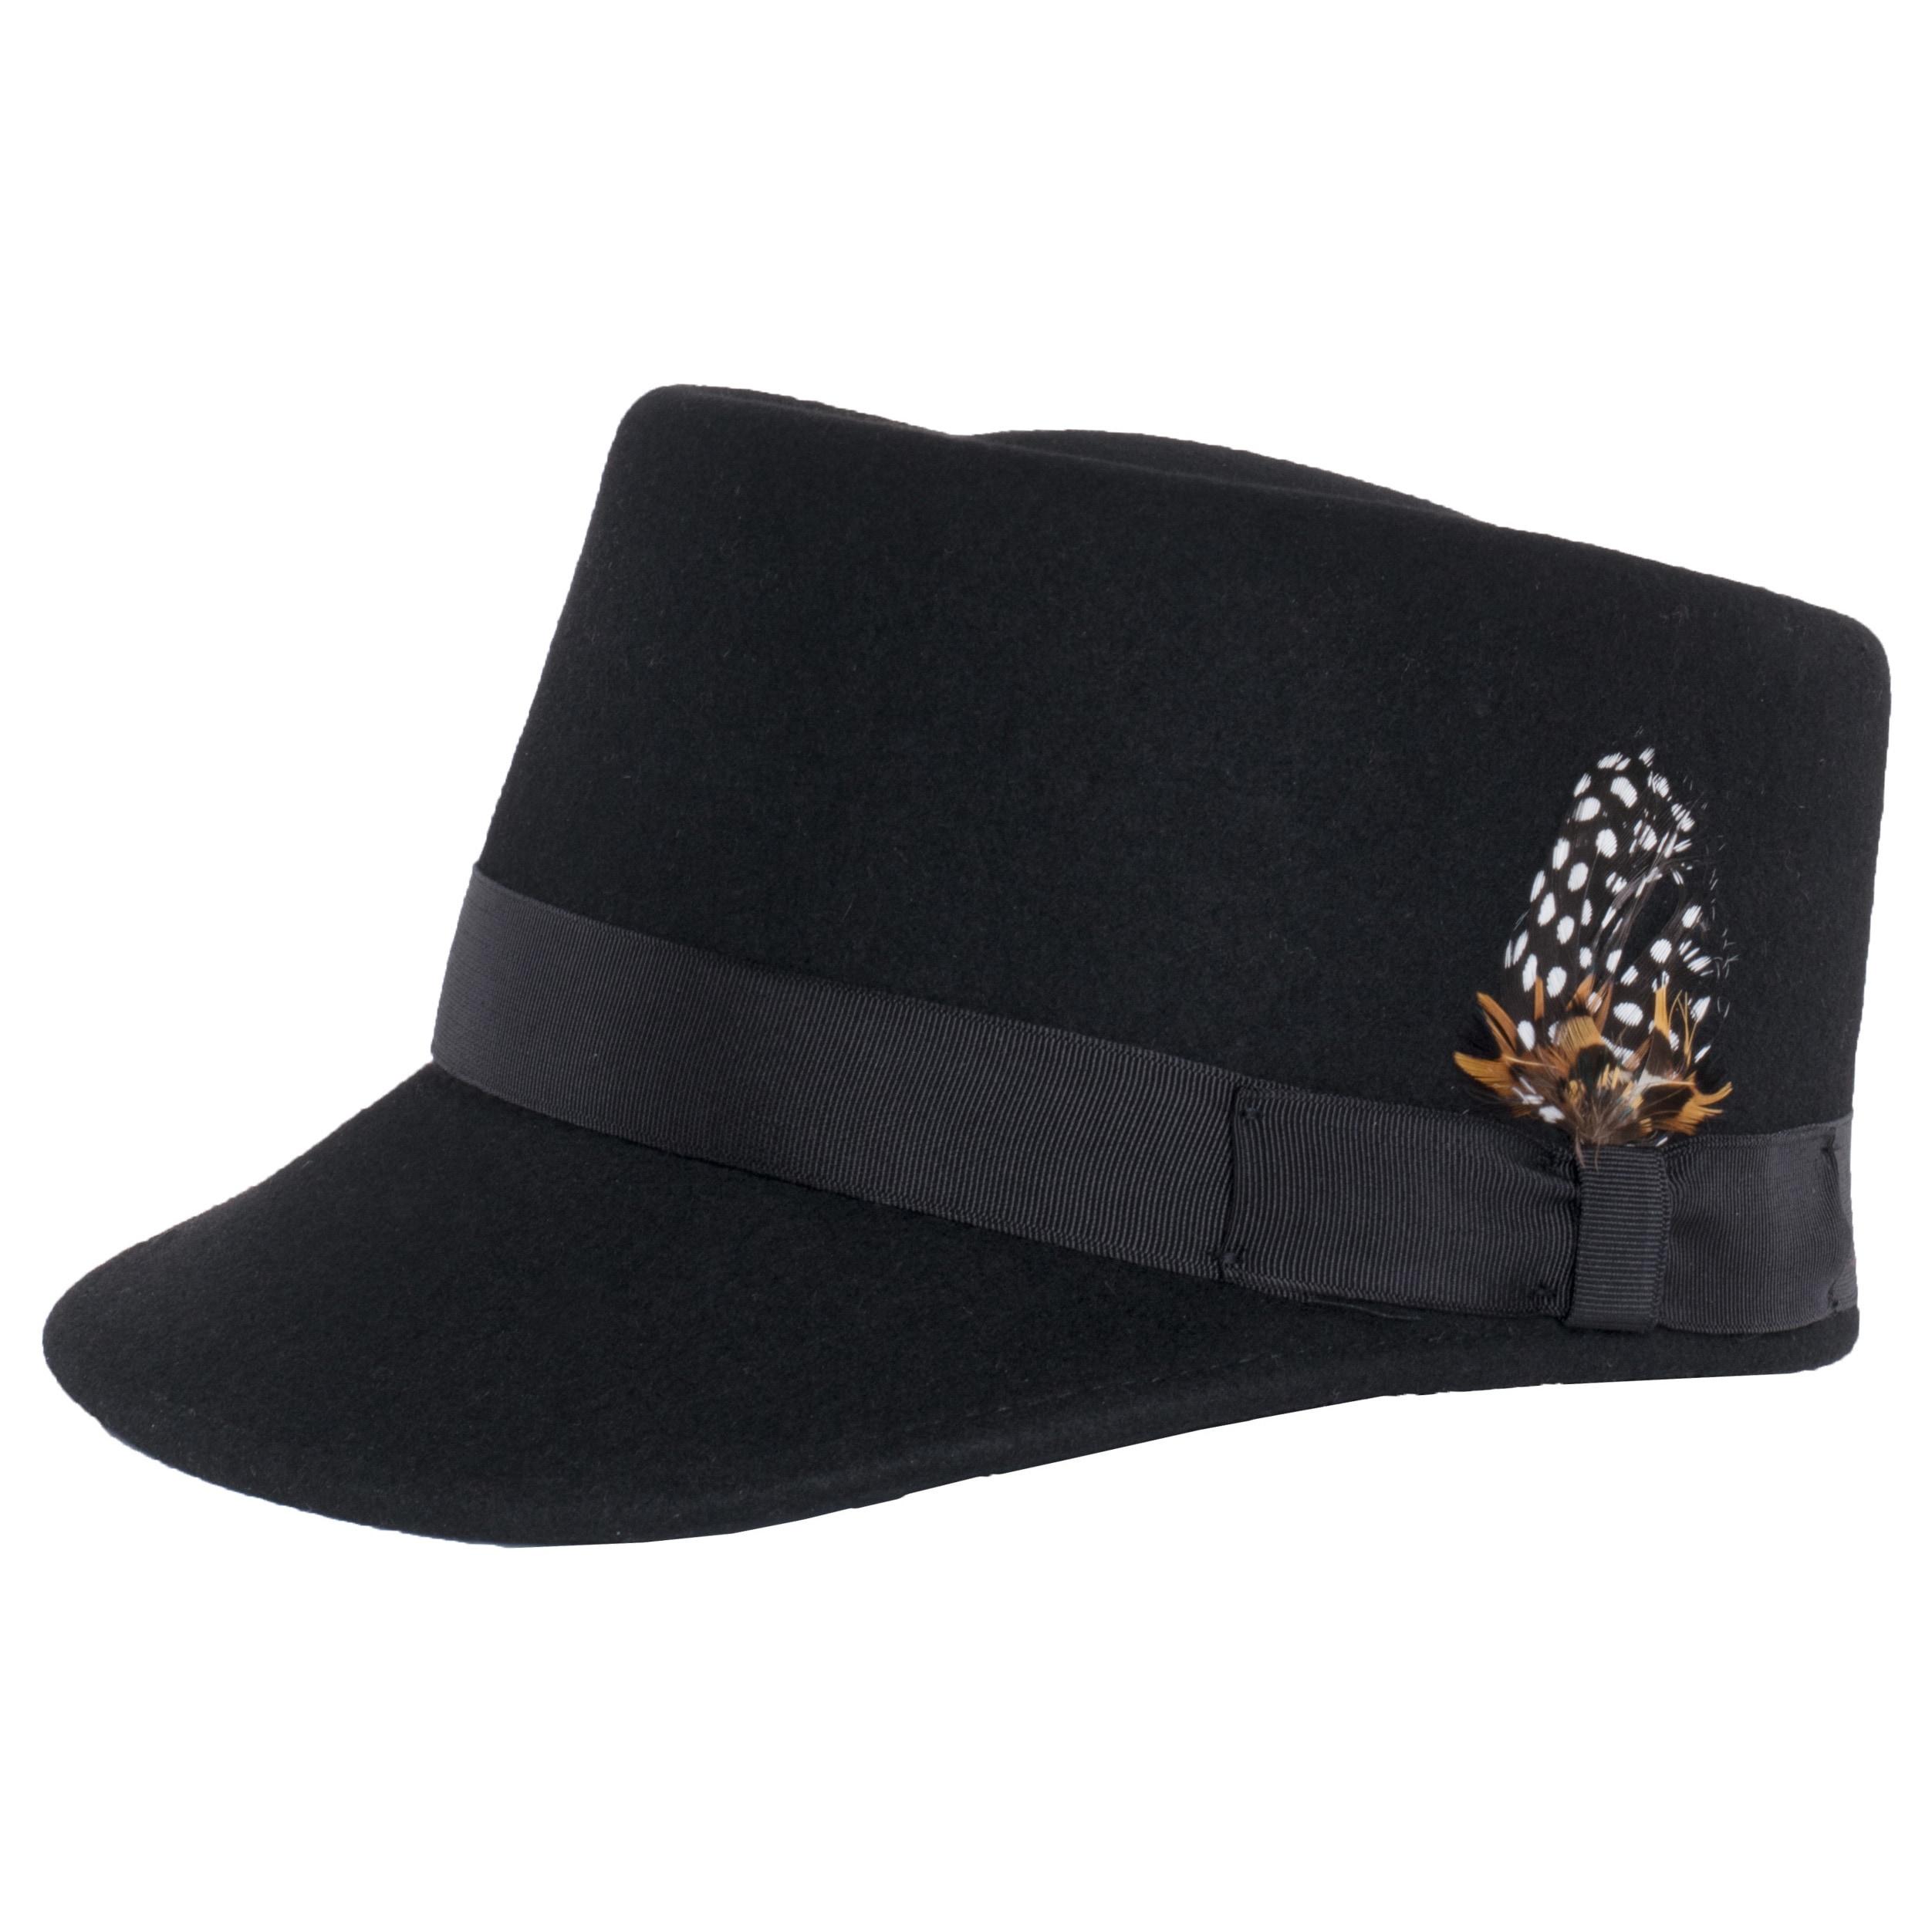 Shop Ferrecci Modern Conductor Train Engineer Hat with Feather ... 619dea691b1